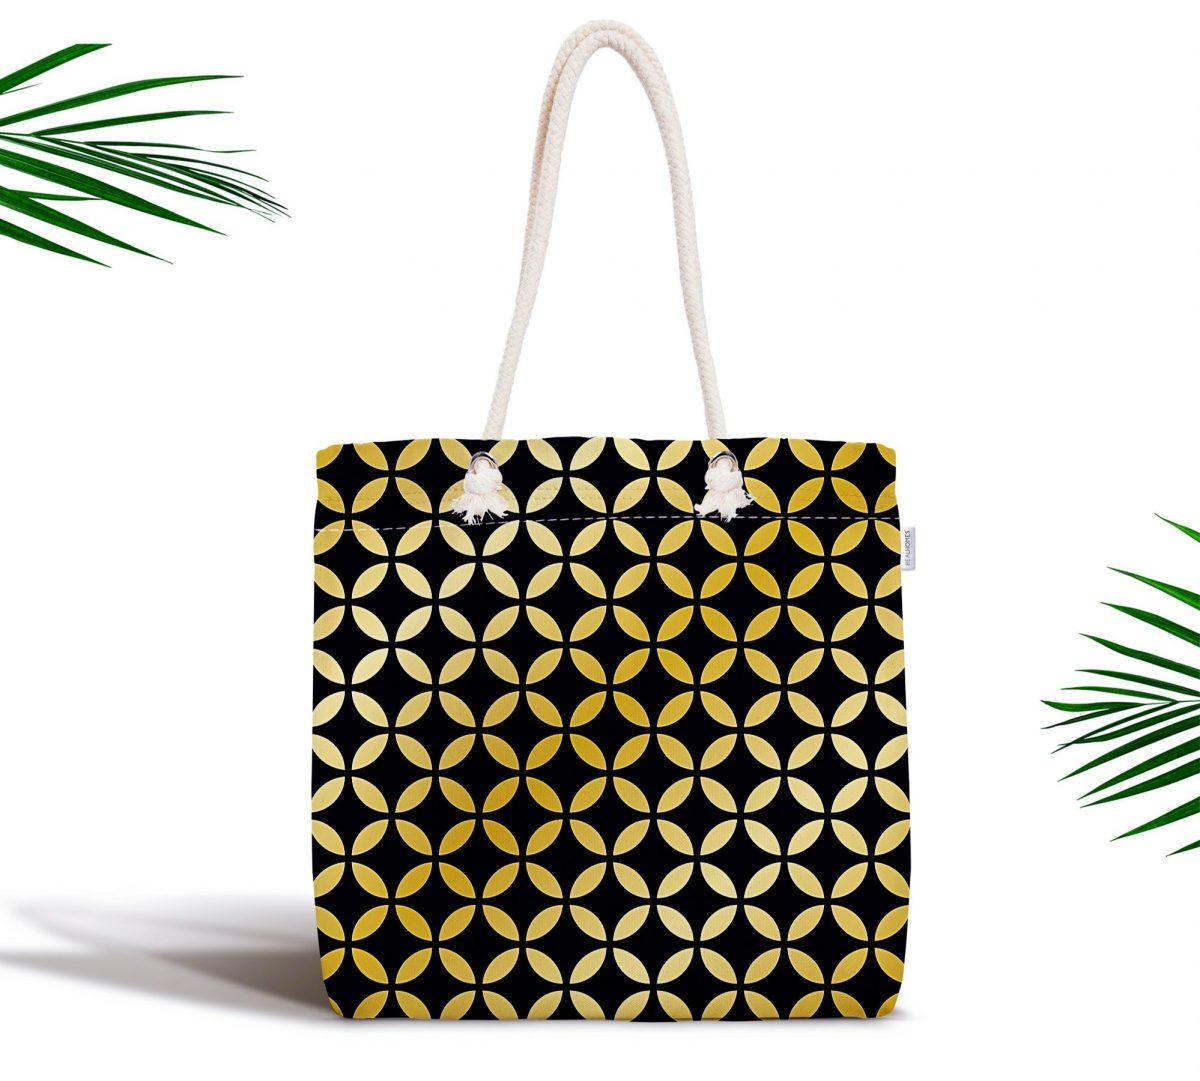 Siyah Zeminde Gold Geometrik Desenli Fermuarlı Modern Kumaş Çanta Realhomes